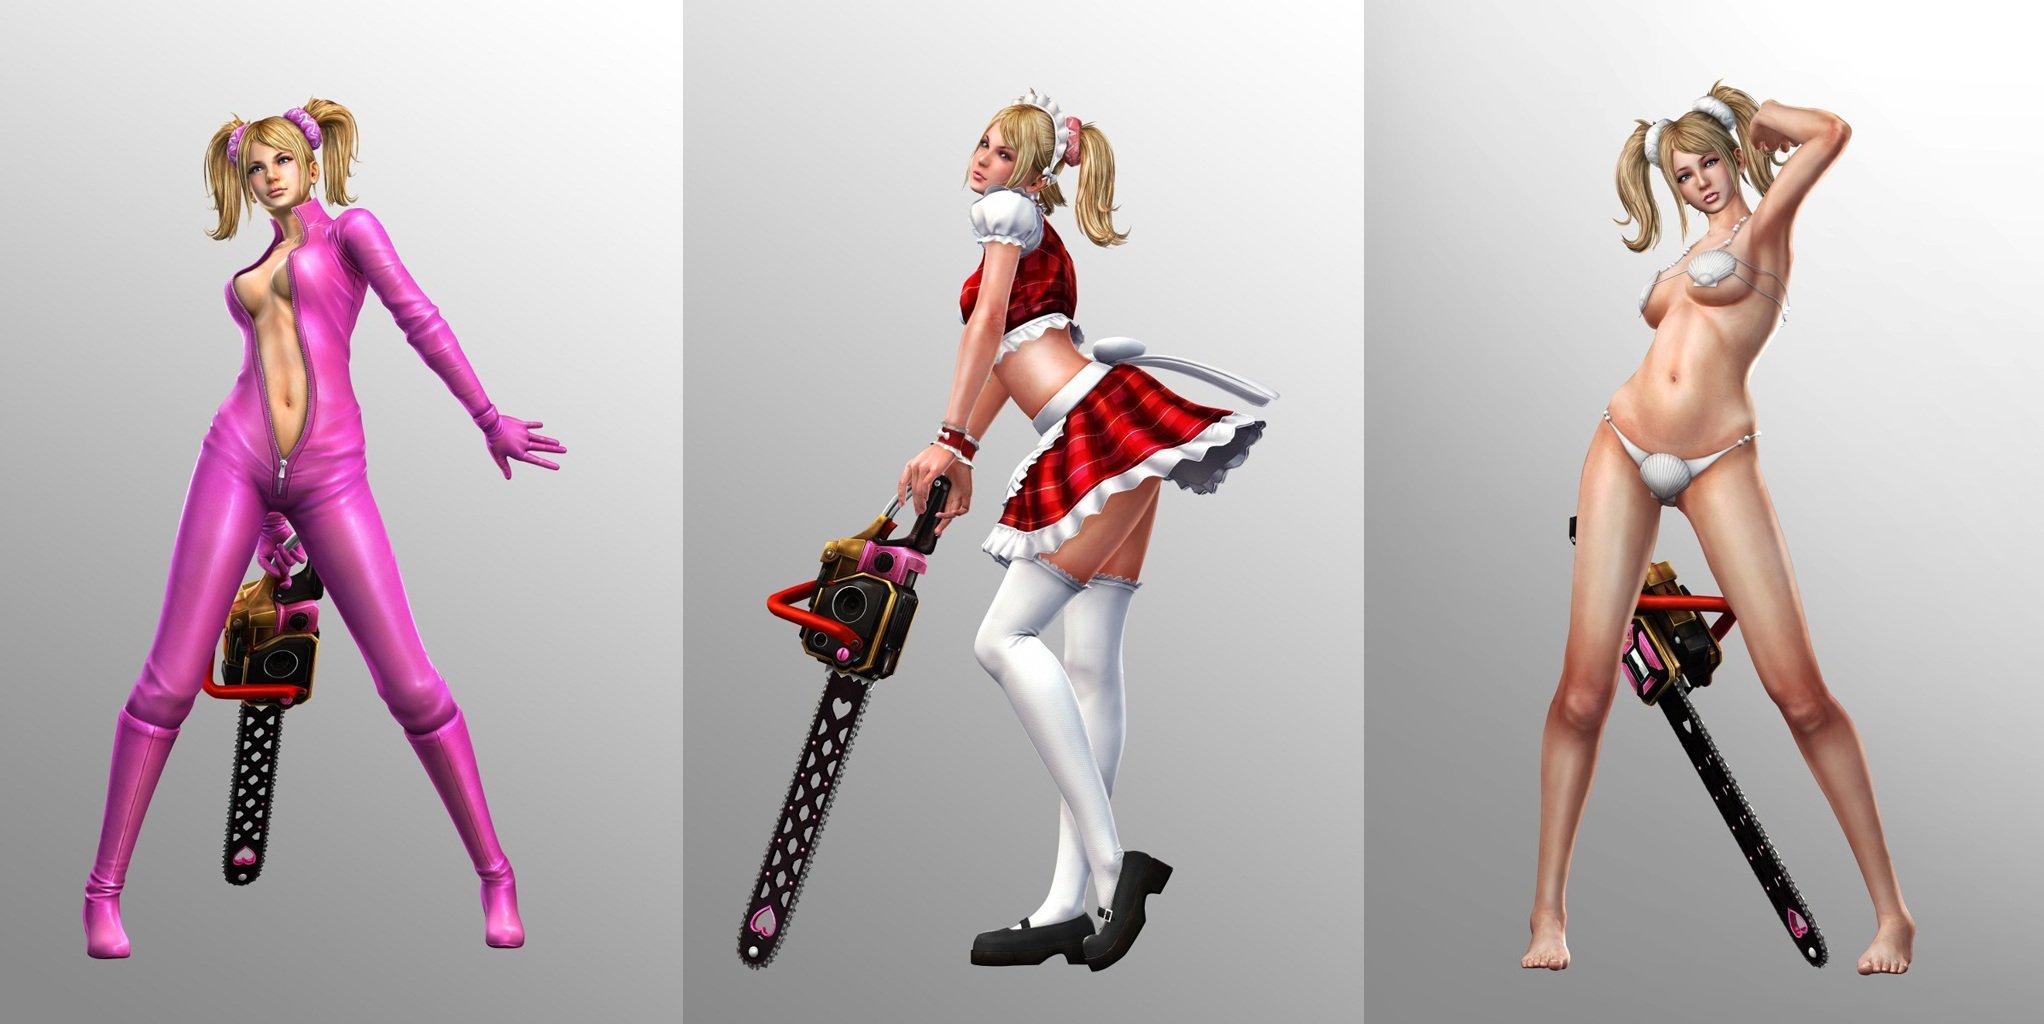 Jessica Nigri Lollipop Chainsaw Cosplay   Babes HD Wallpaper 2044x1024